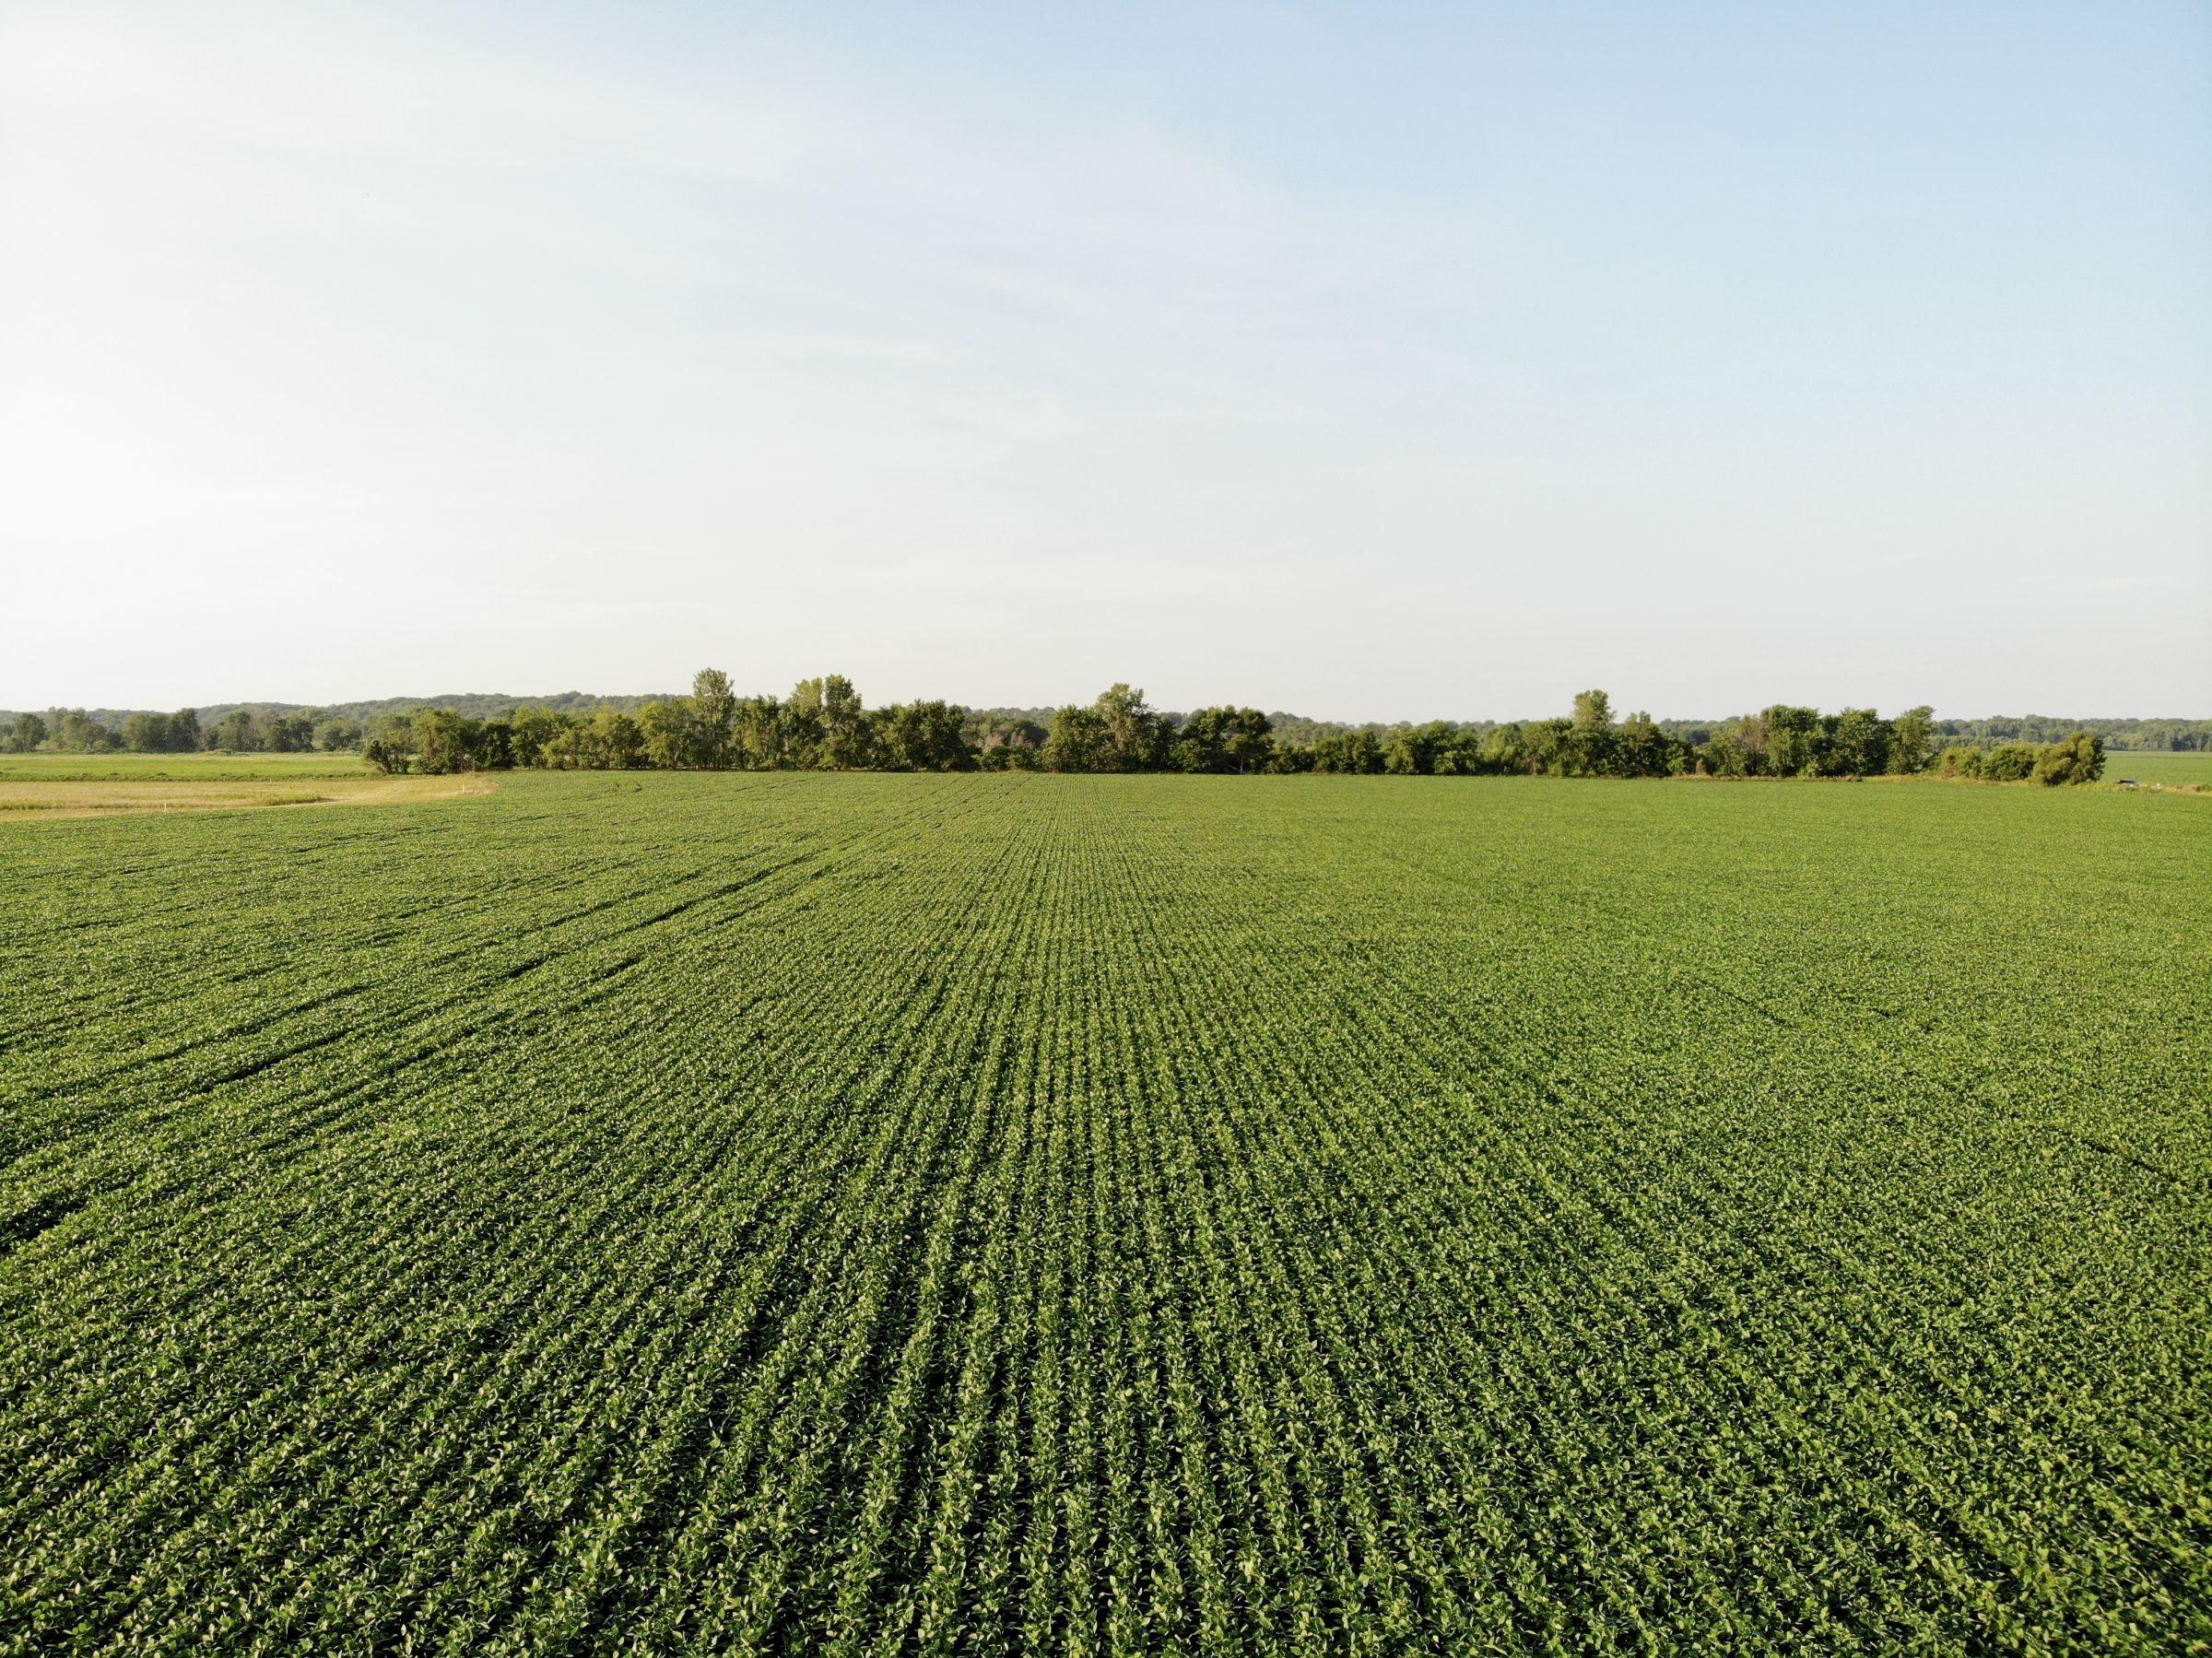 land-warren-county-iowa-27-acres-listing-number-15624-1-2021-07-07-142717.jpg